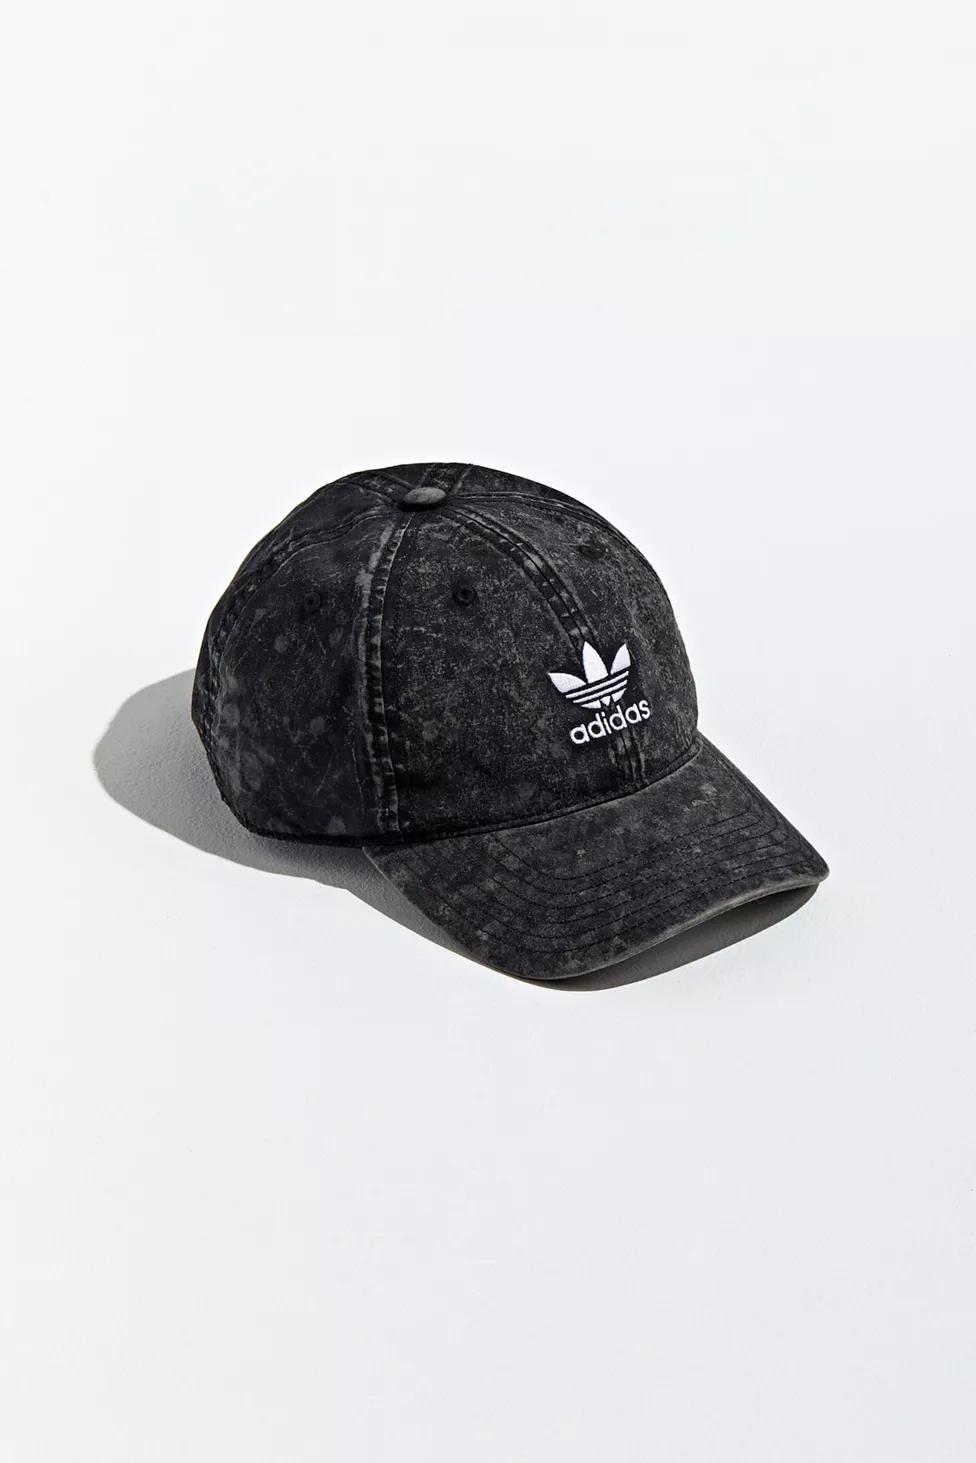 Adidas Originals Cloud Wash Baseball Hat Urban Outfitters Baseball Hats Adidas Originals Hats For Men